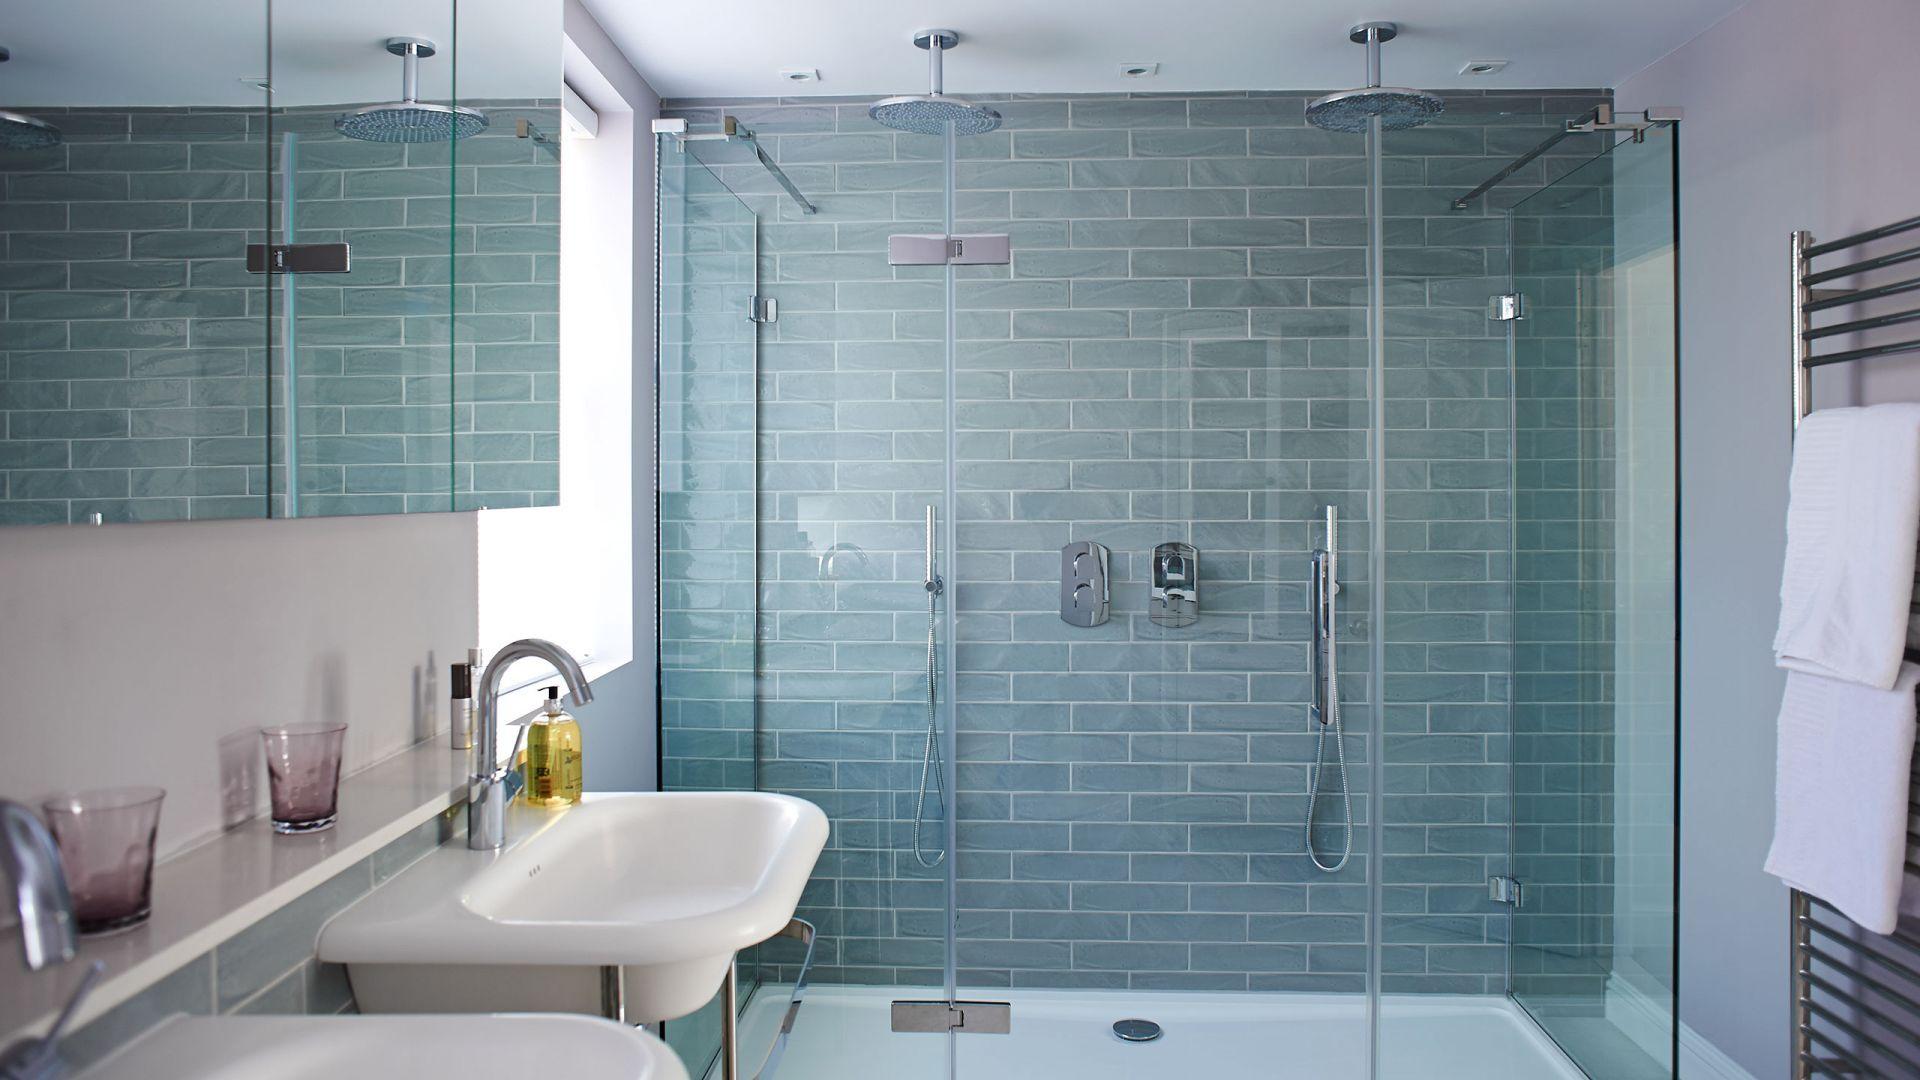 Pin by Latoya Leanna on Lux   Pinterest   Double shower, Blue tiles ...